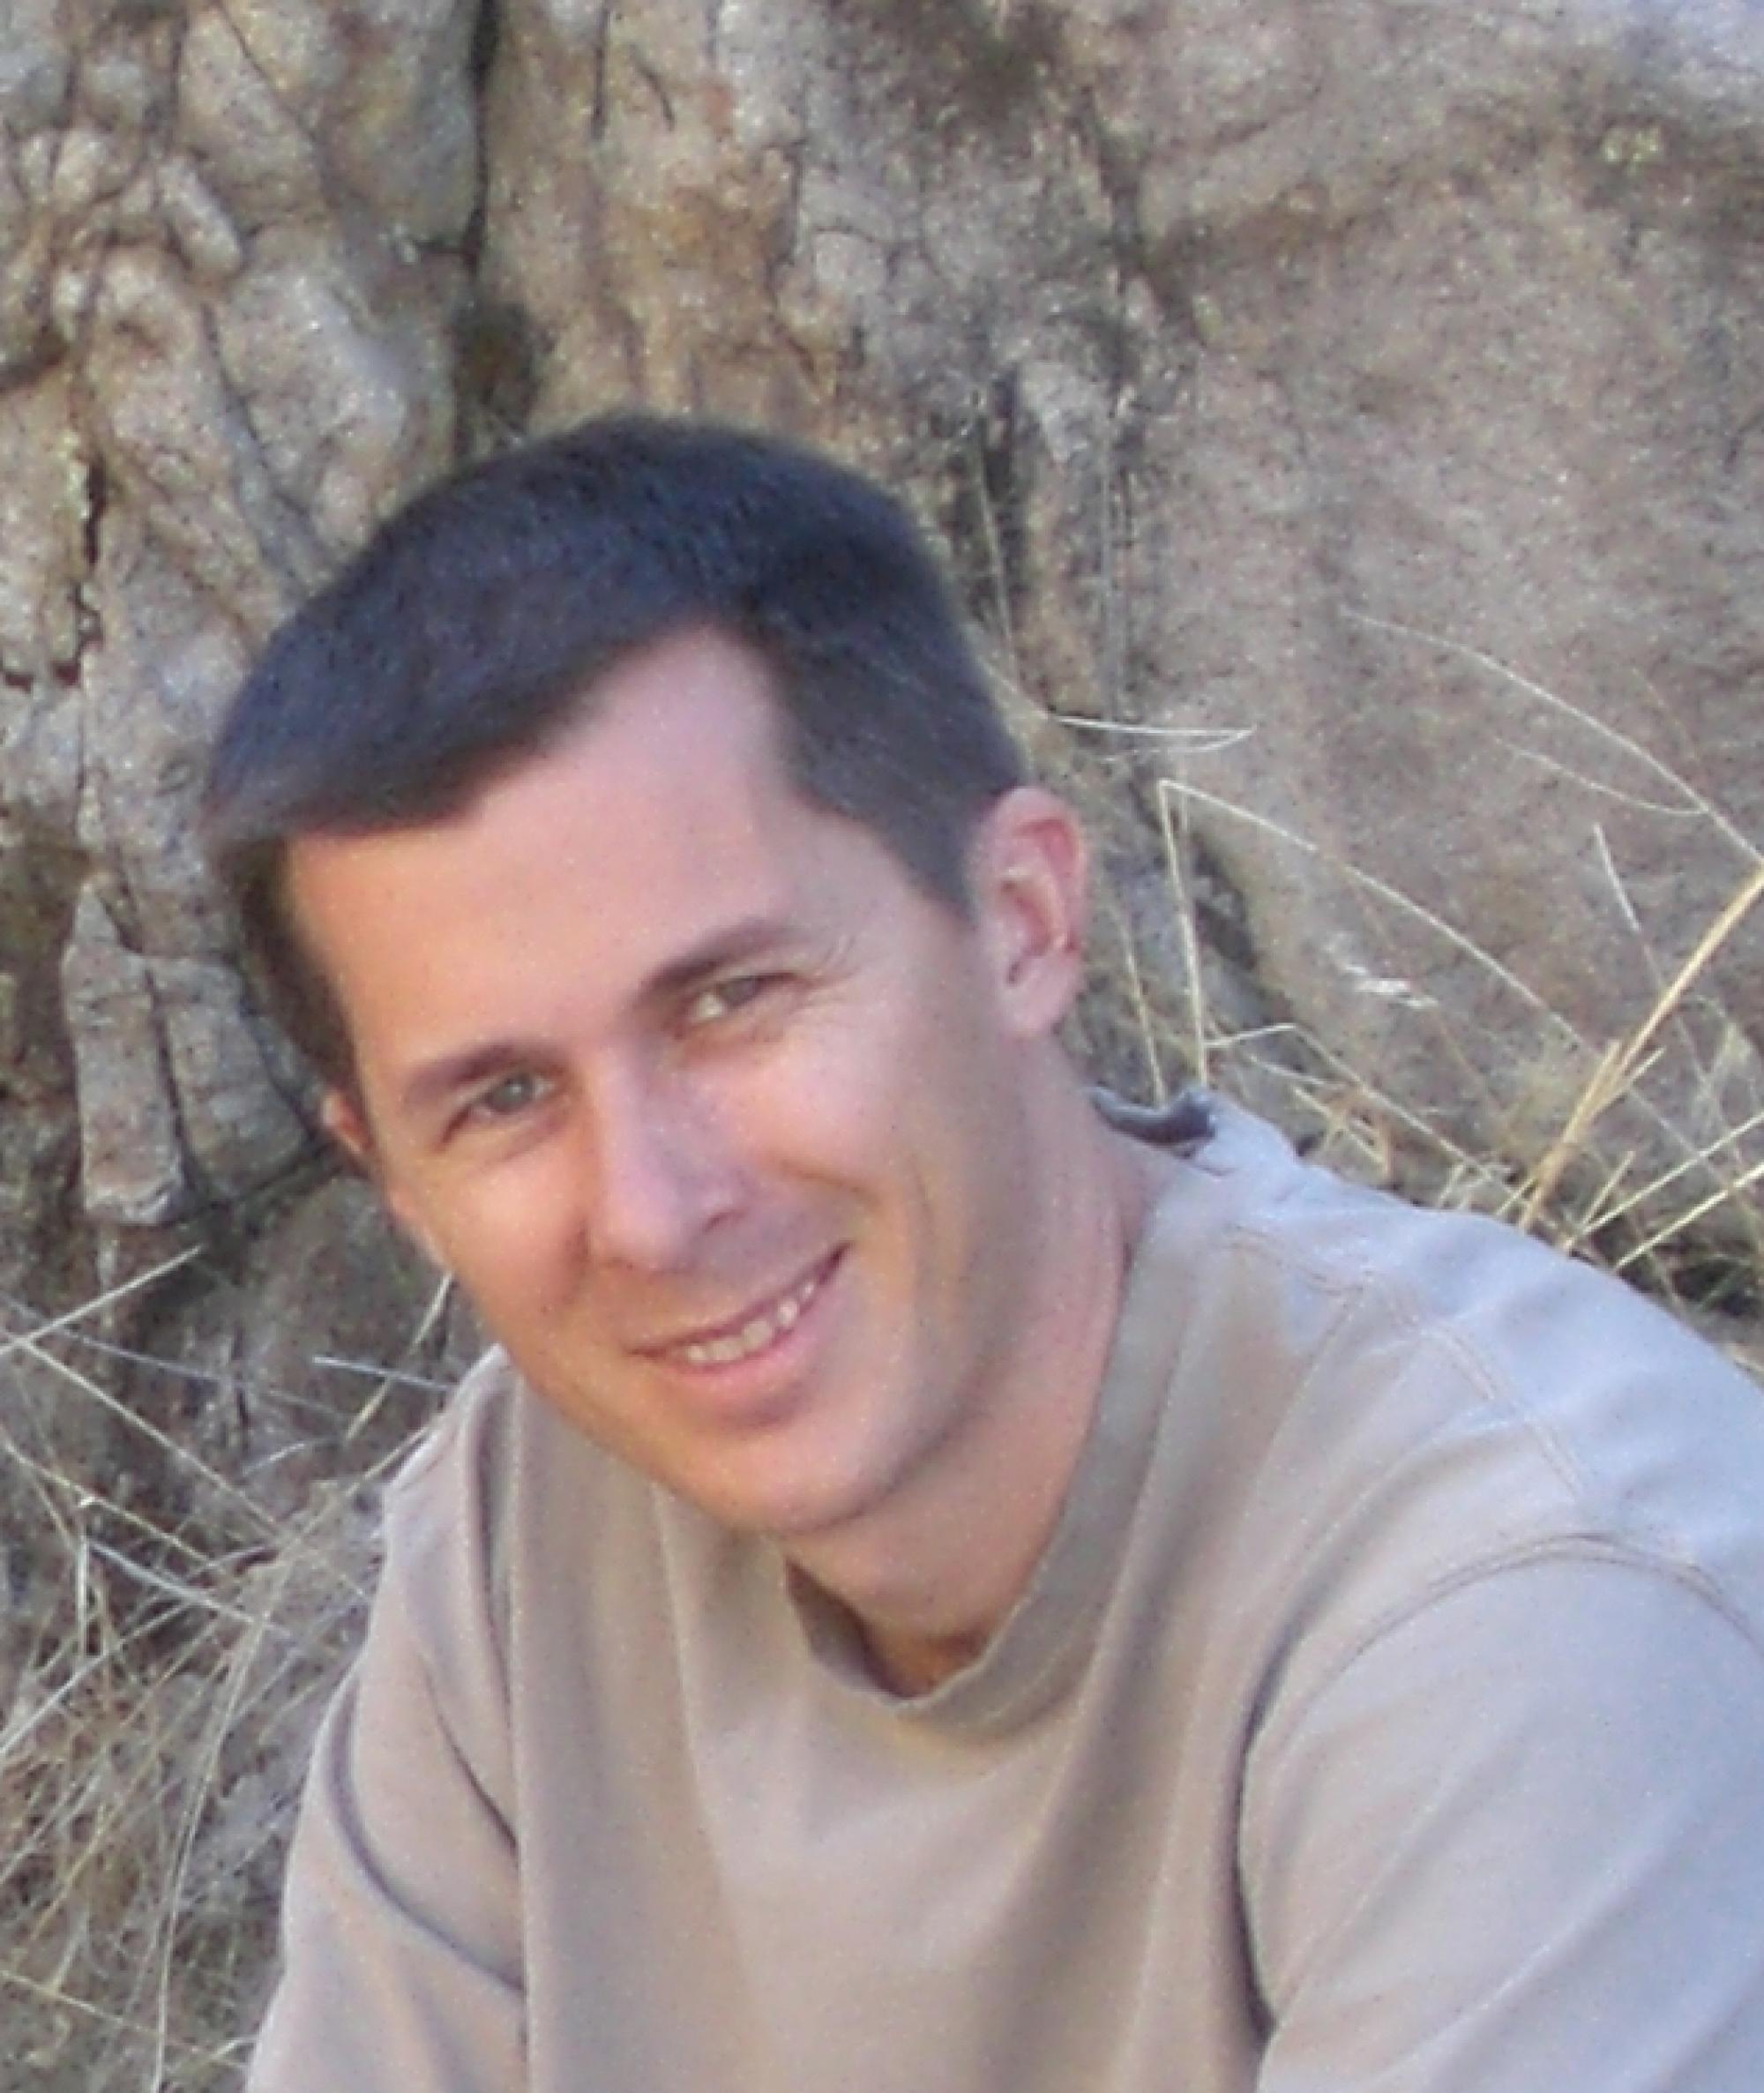 Matthew Herron